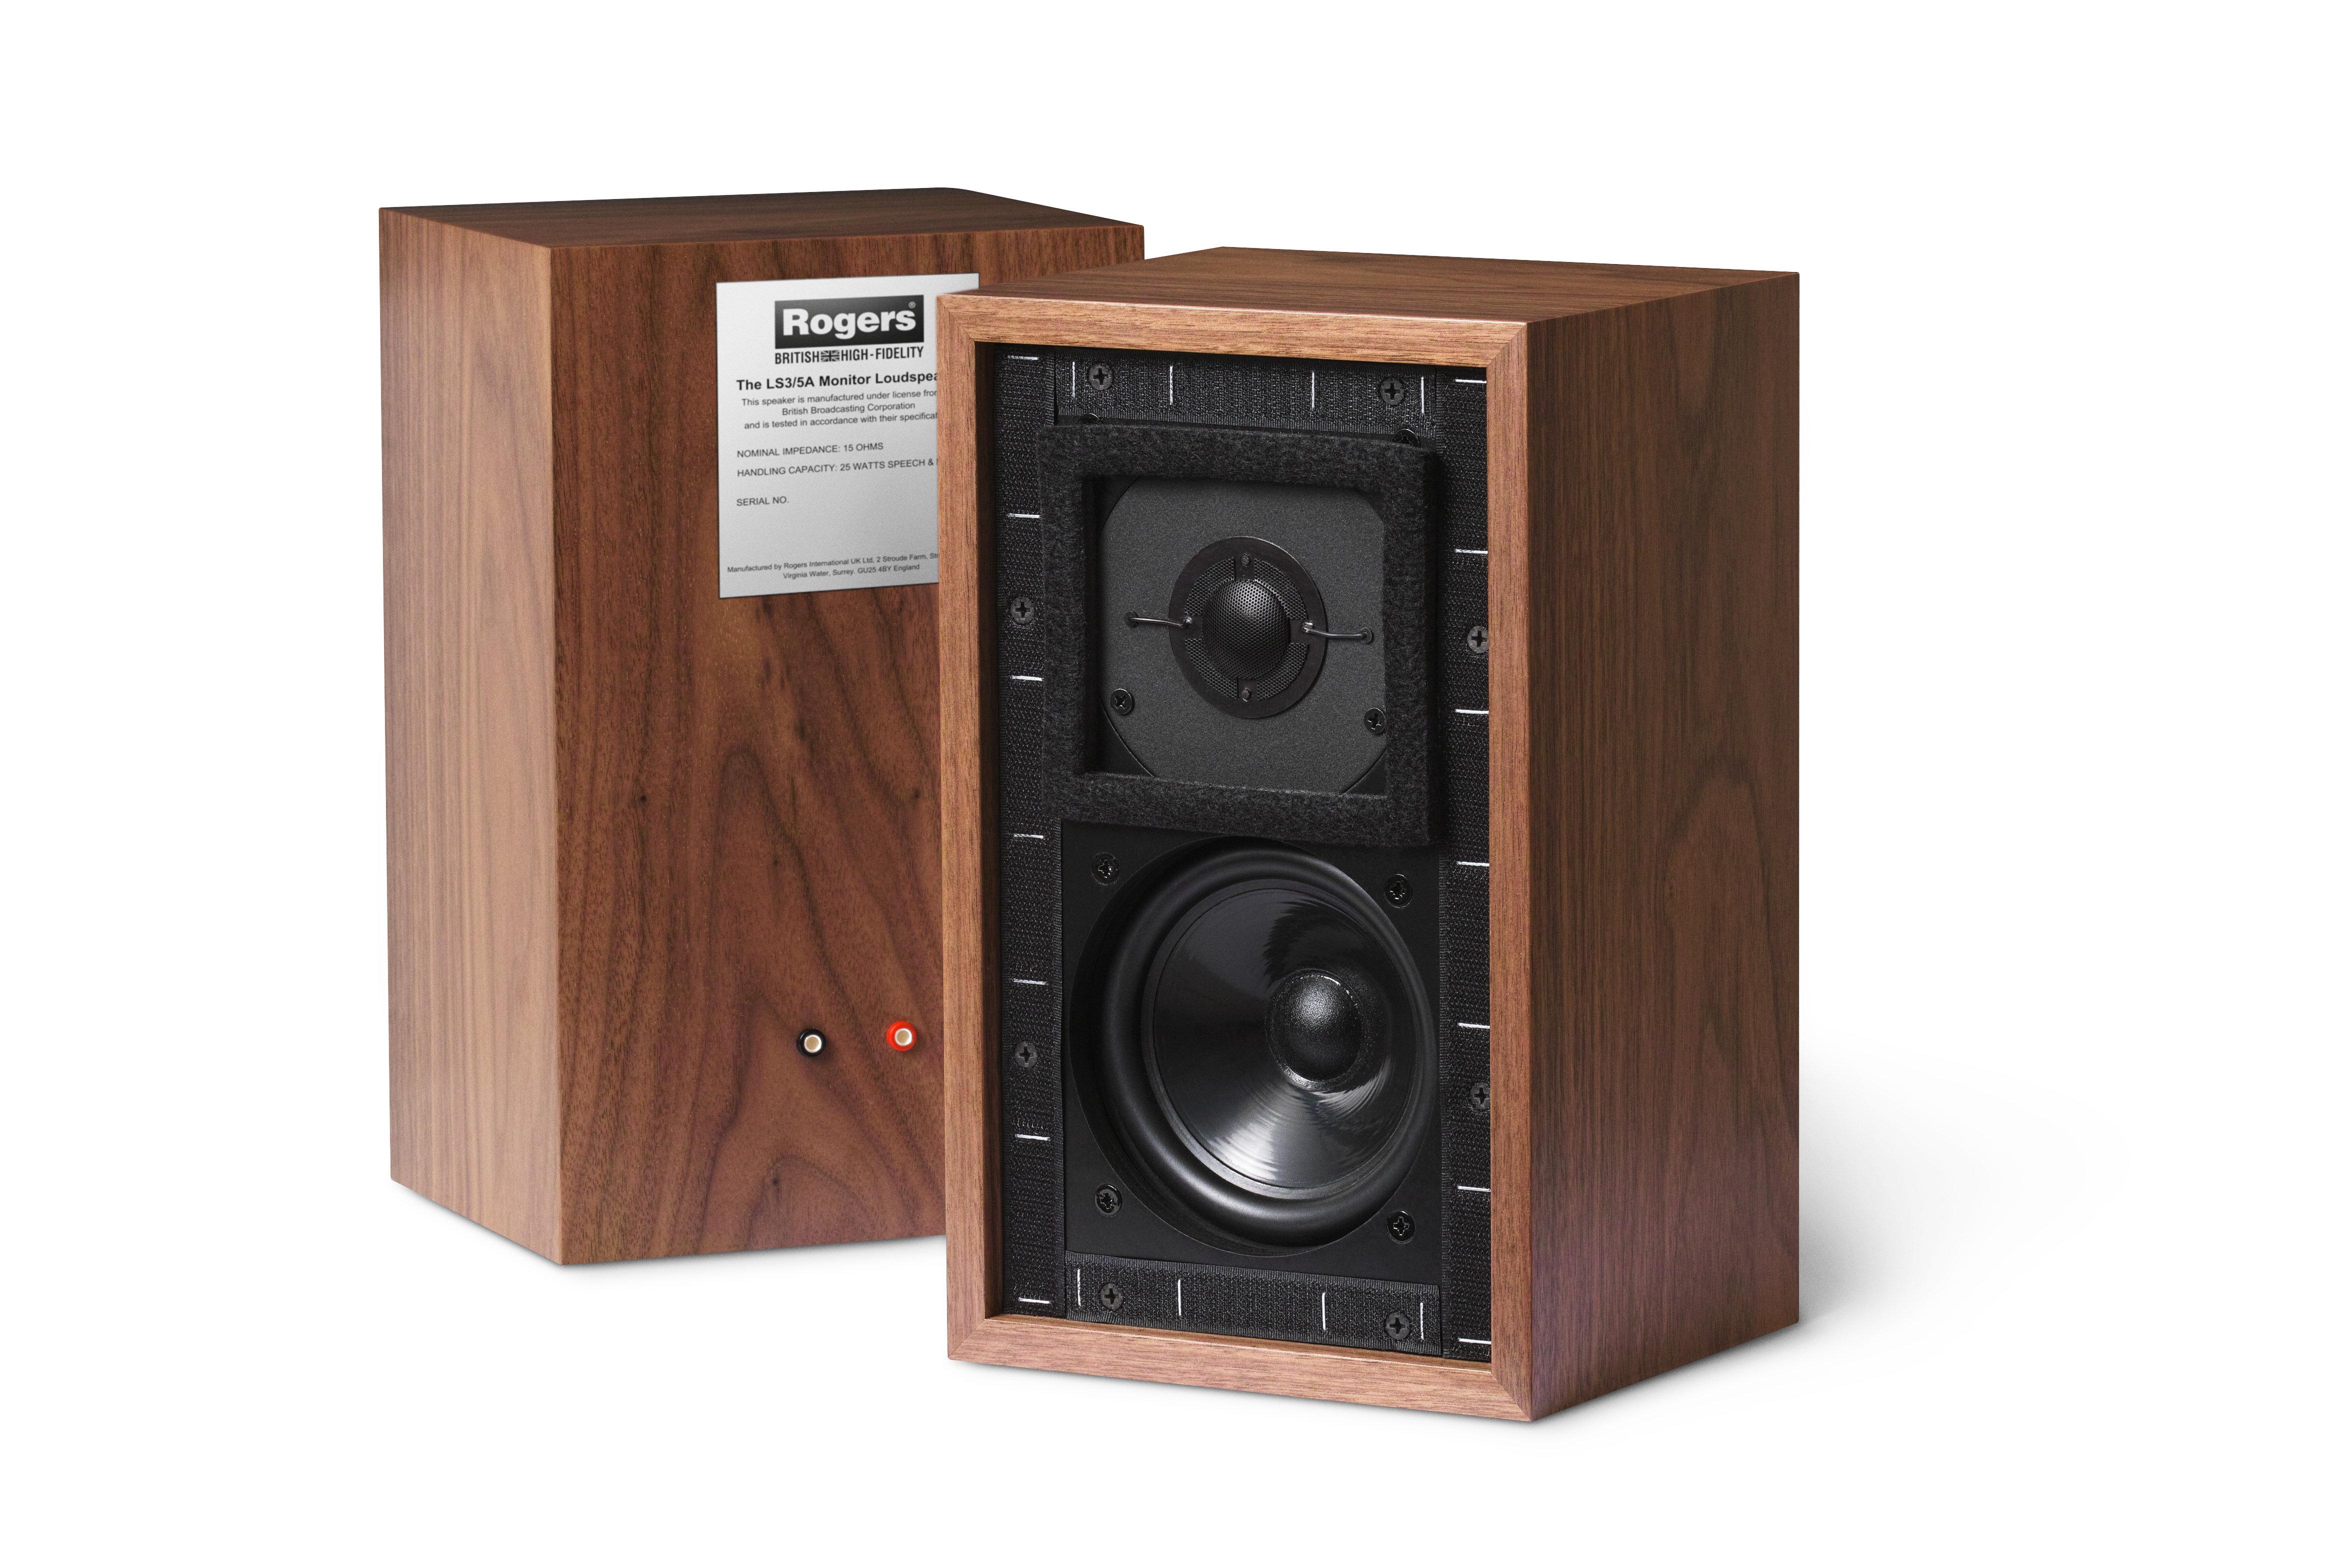 Rogers Speaker LS3/5A Classic (Rosewood) | LTKH TRADING PTE LTD